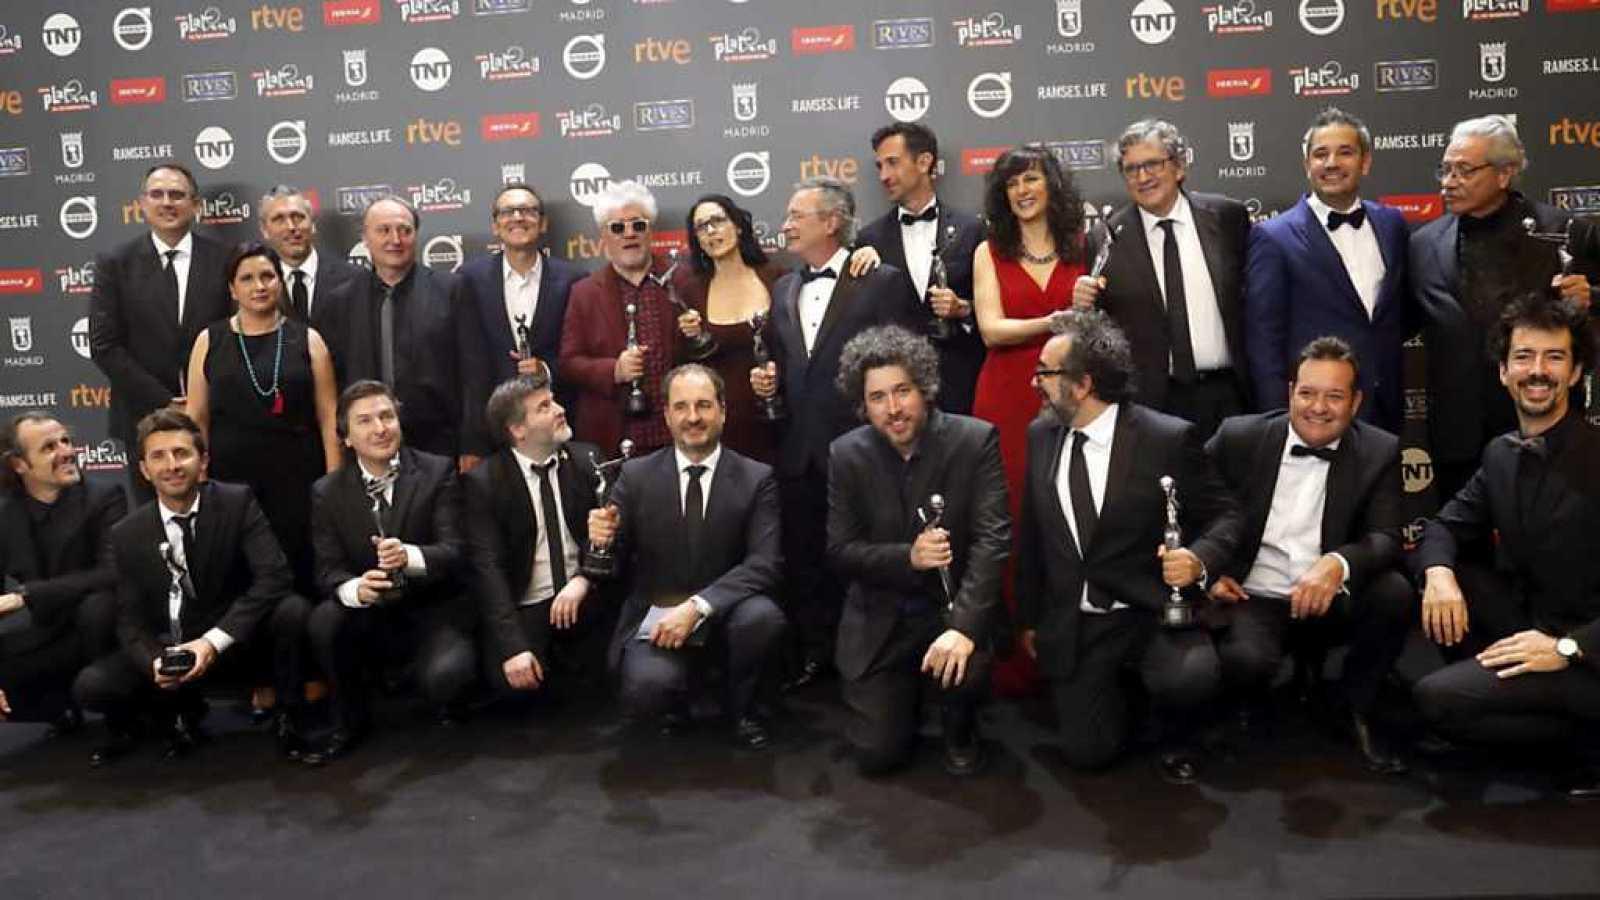 Premios Platino 2017 - RTVE.es